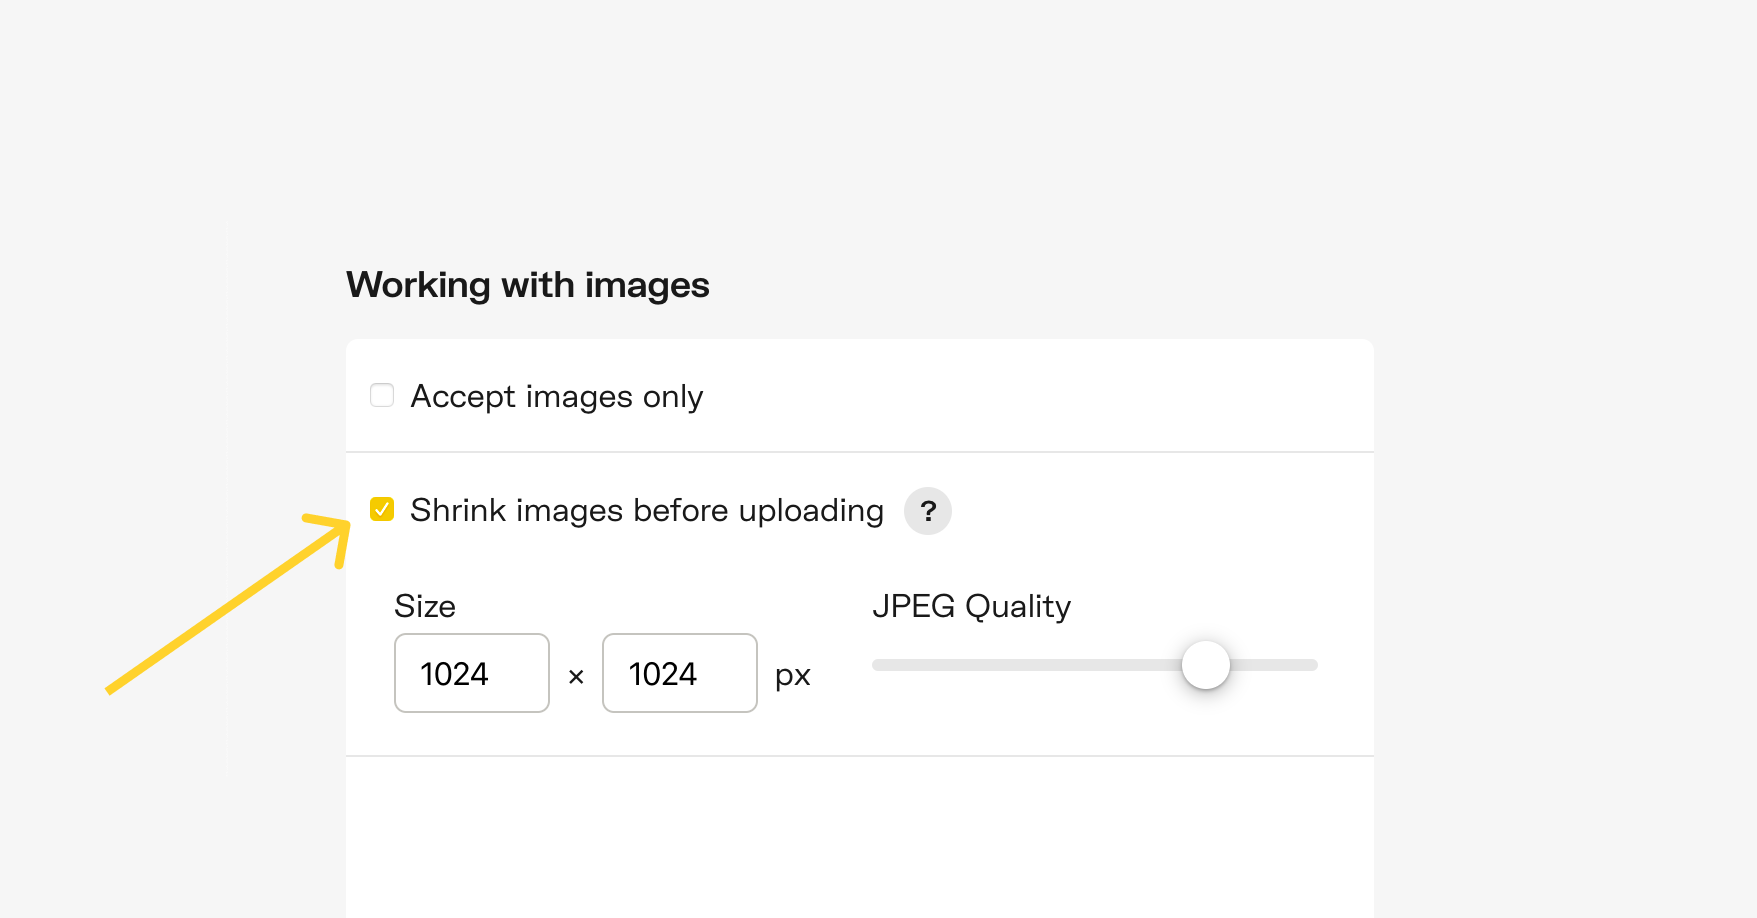 Shrink images before uploading